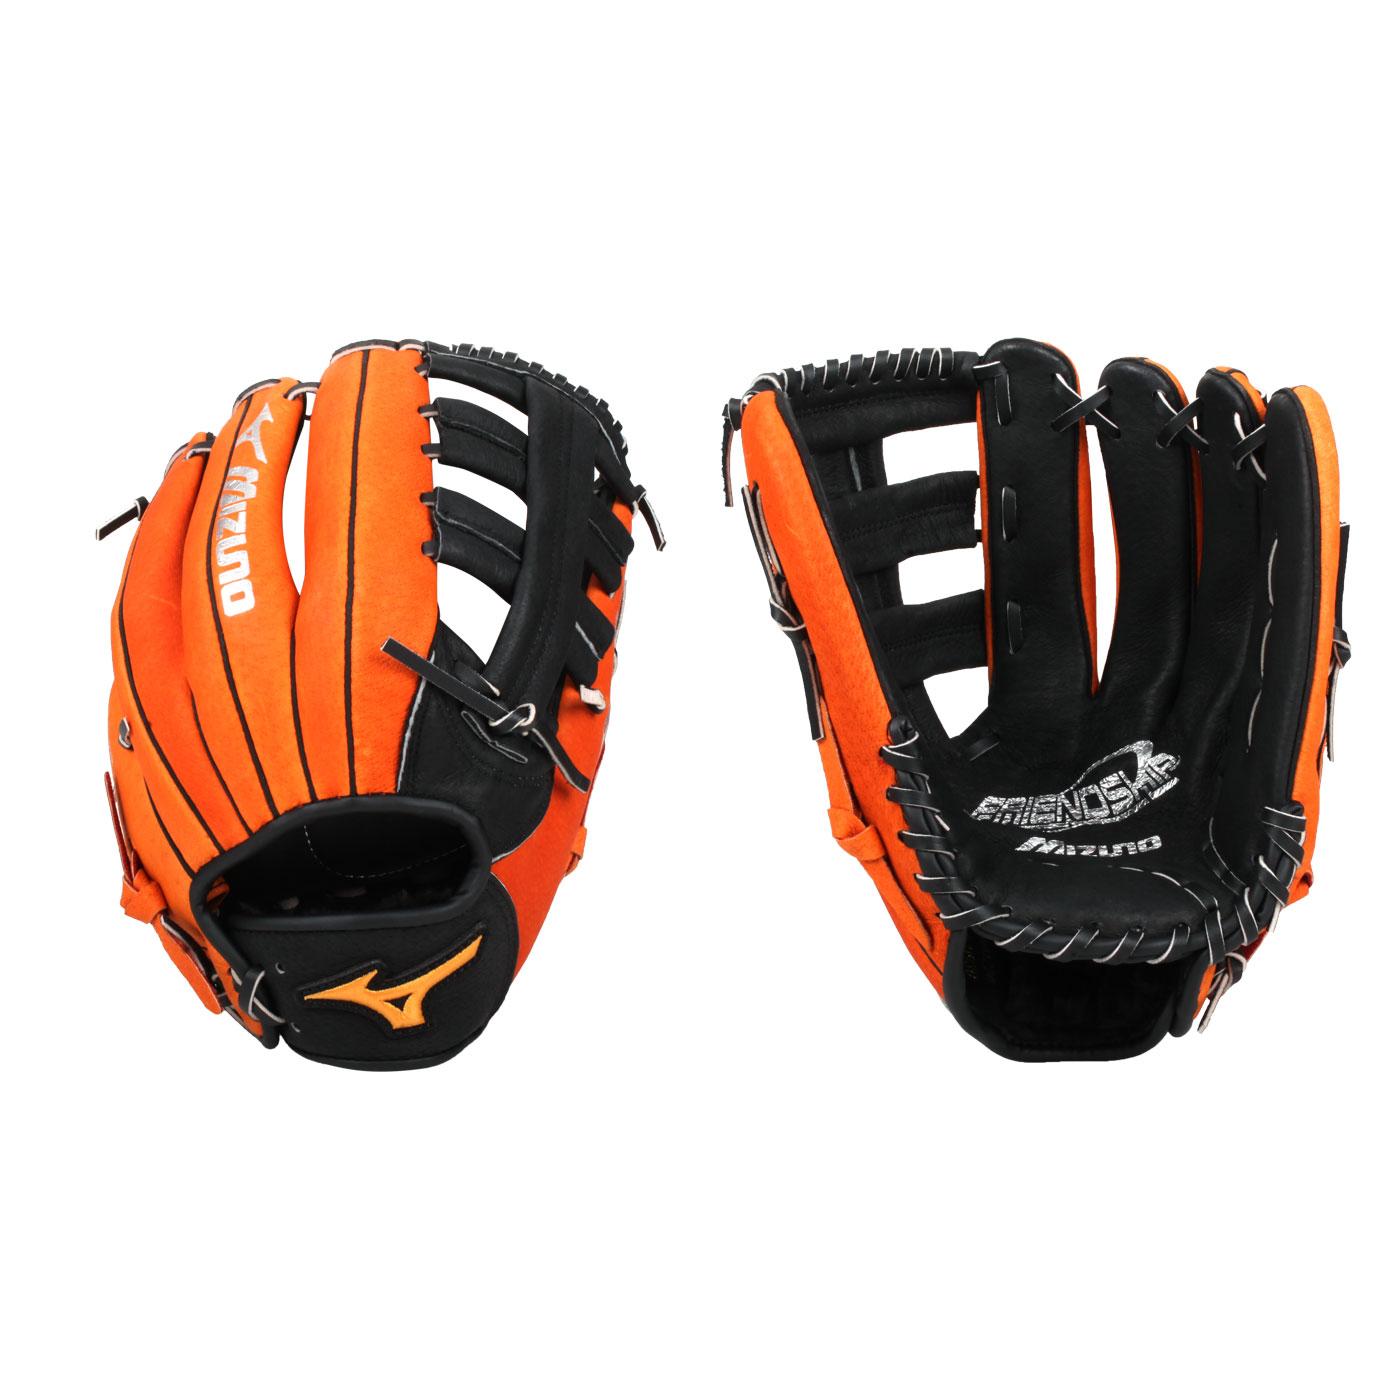 MIZUNO 壘球手套 1ATGS21930-0951